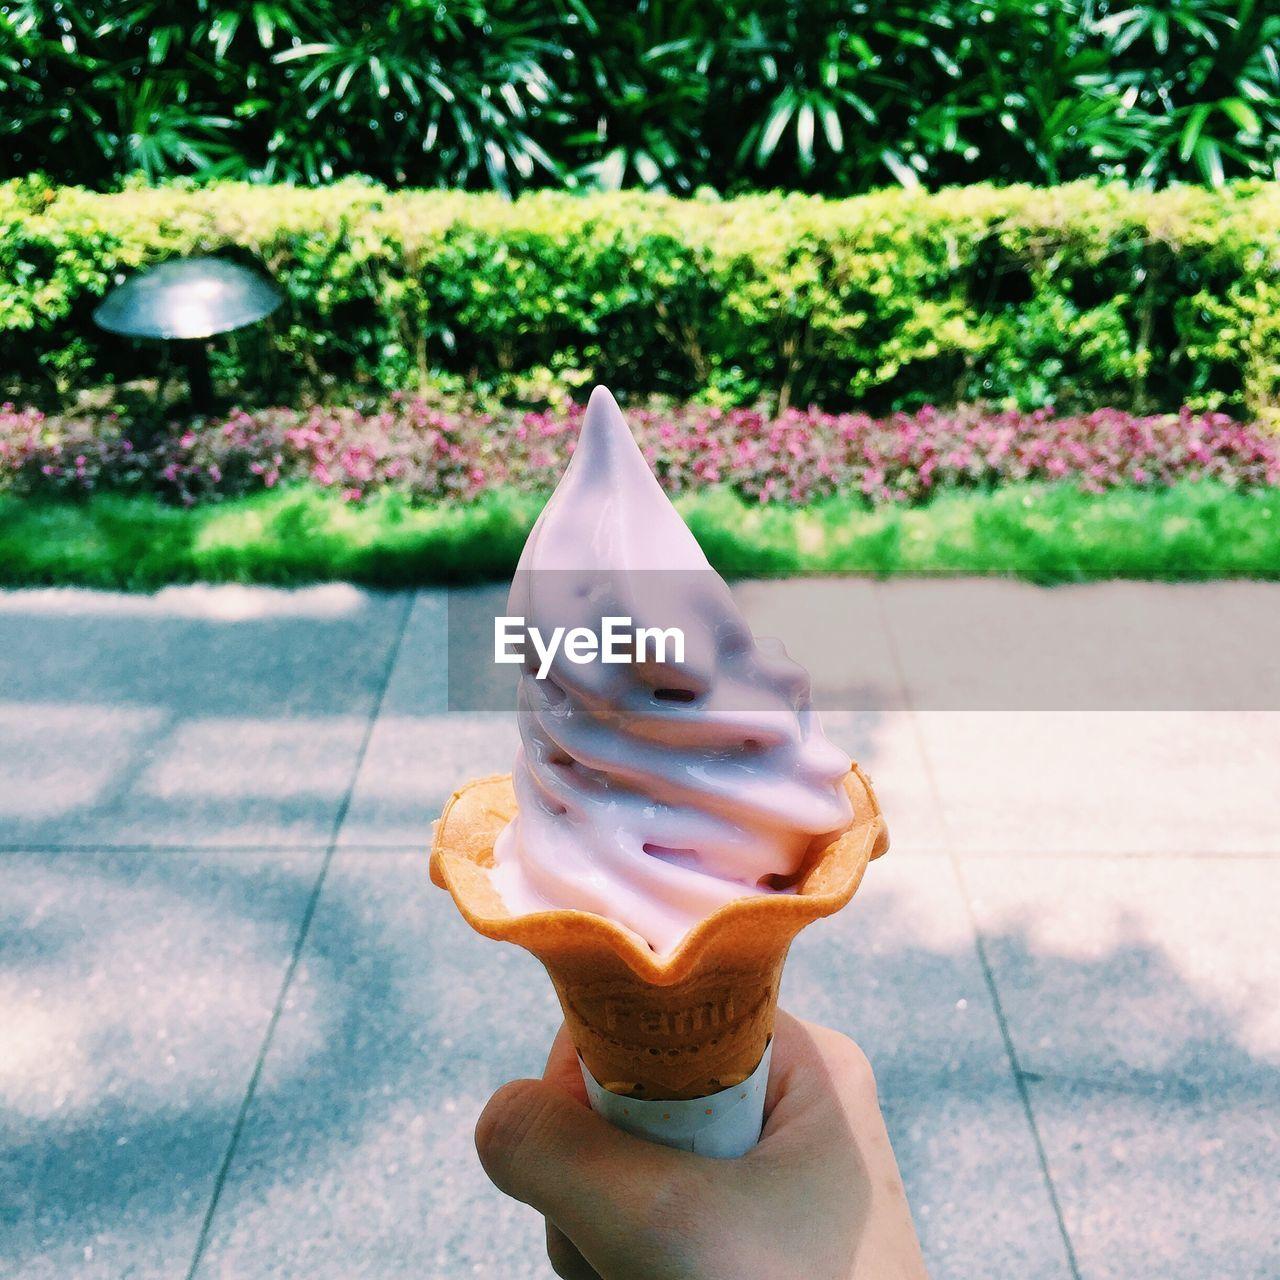 Cropped image of hand holding strawberry ice cream on sidewalk